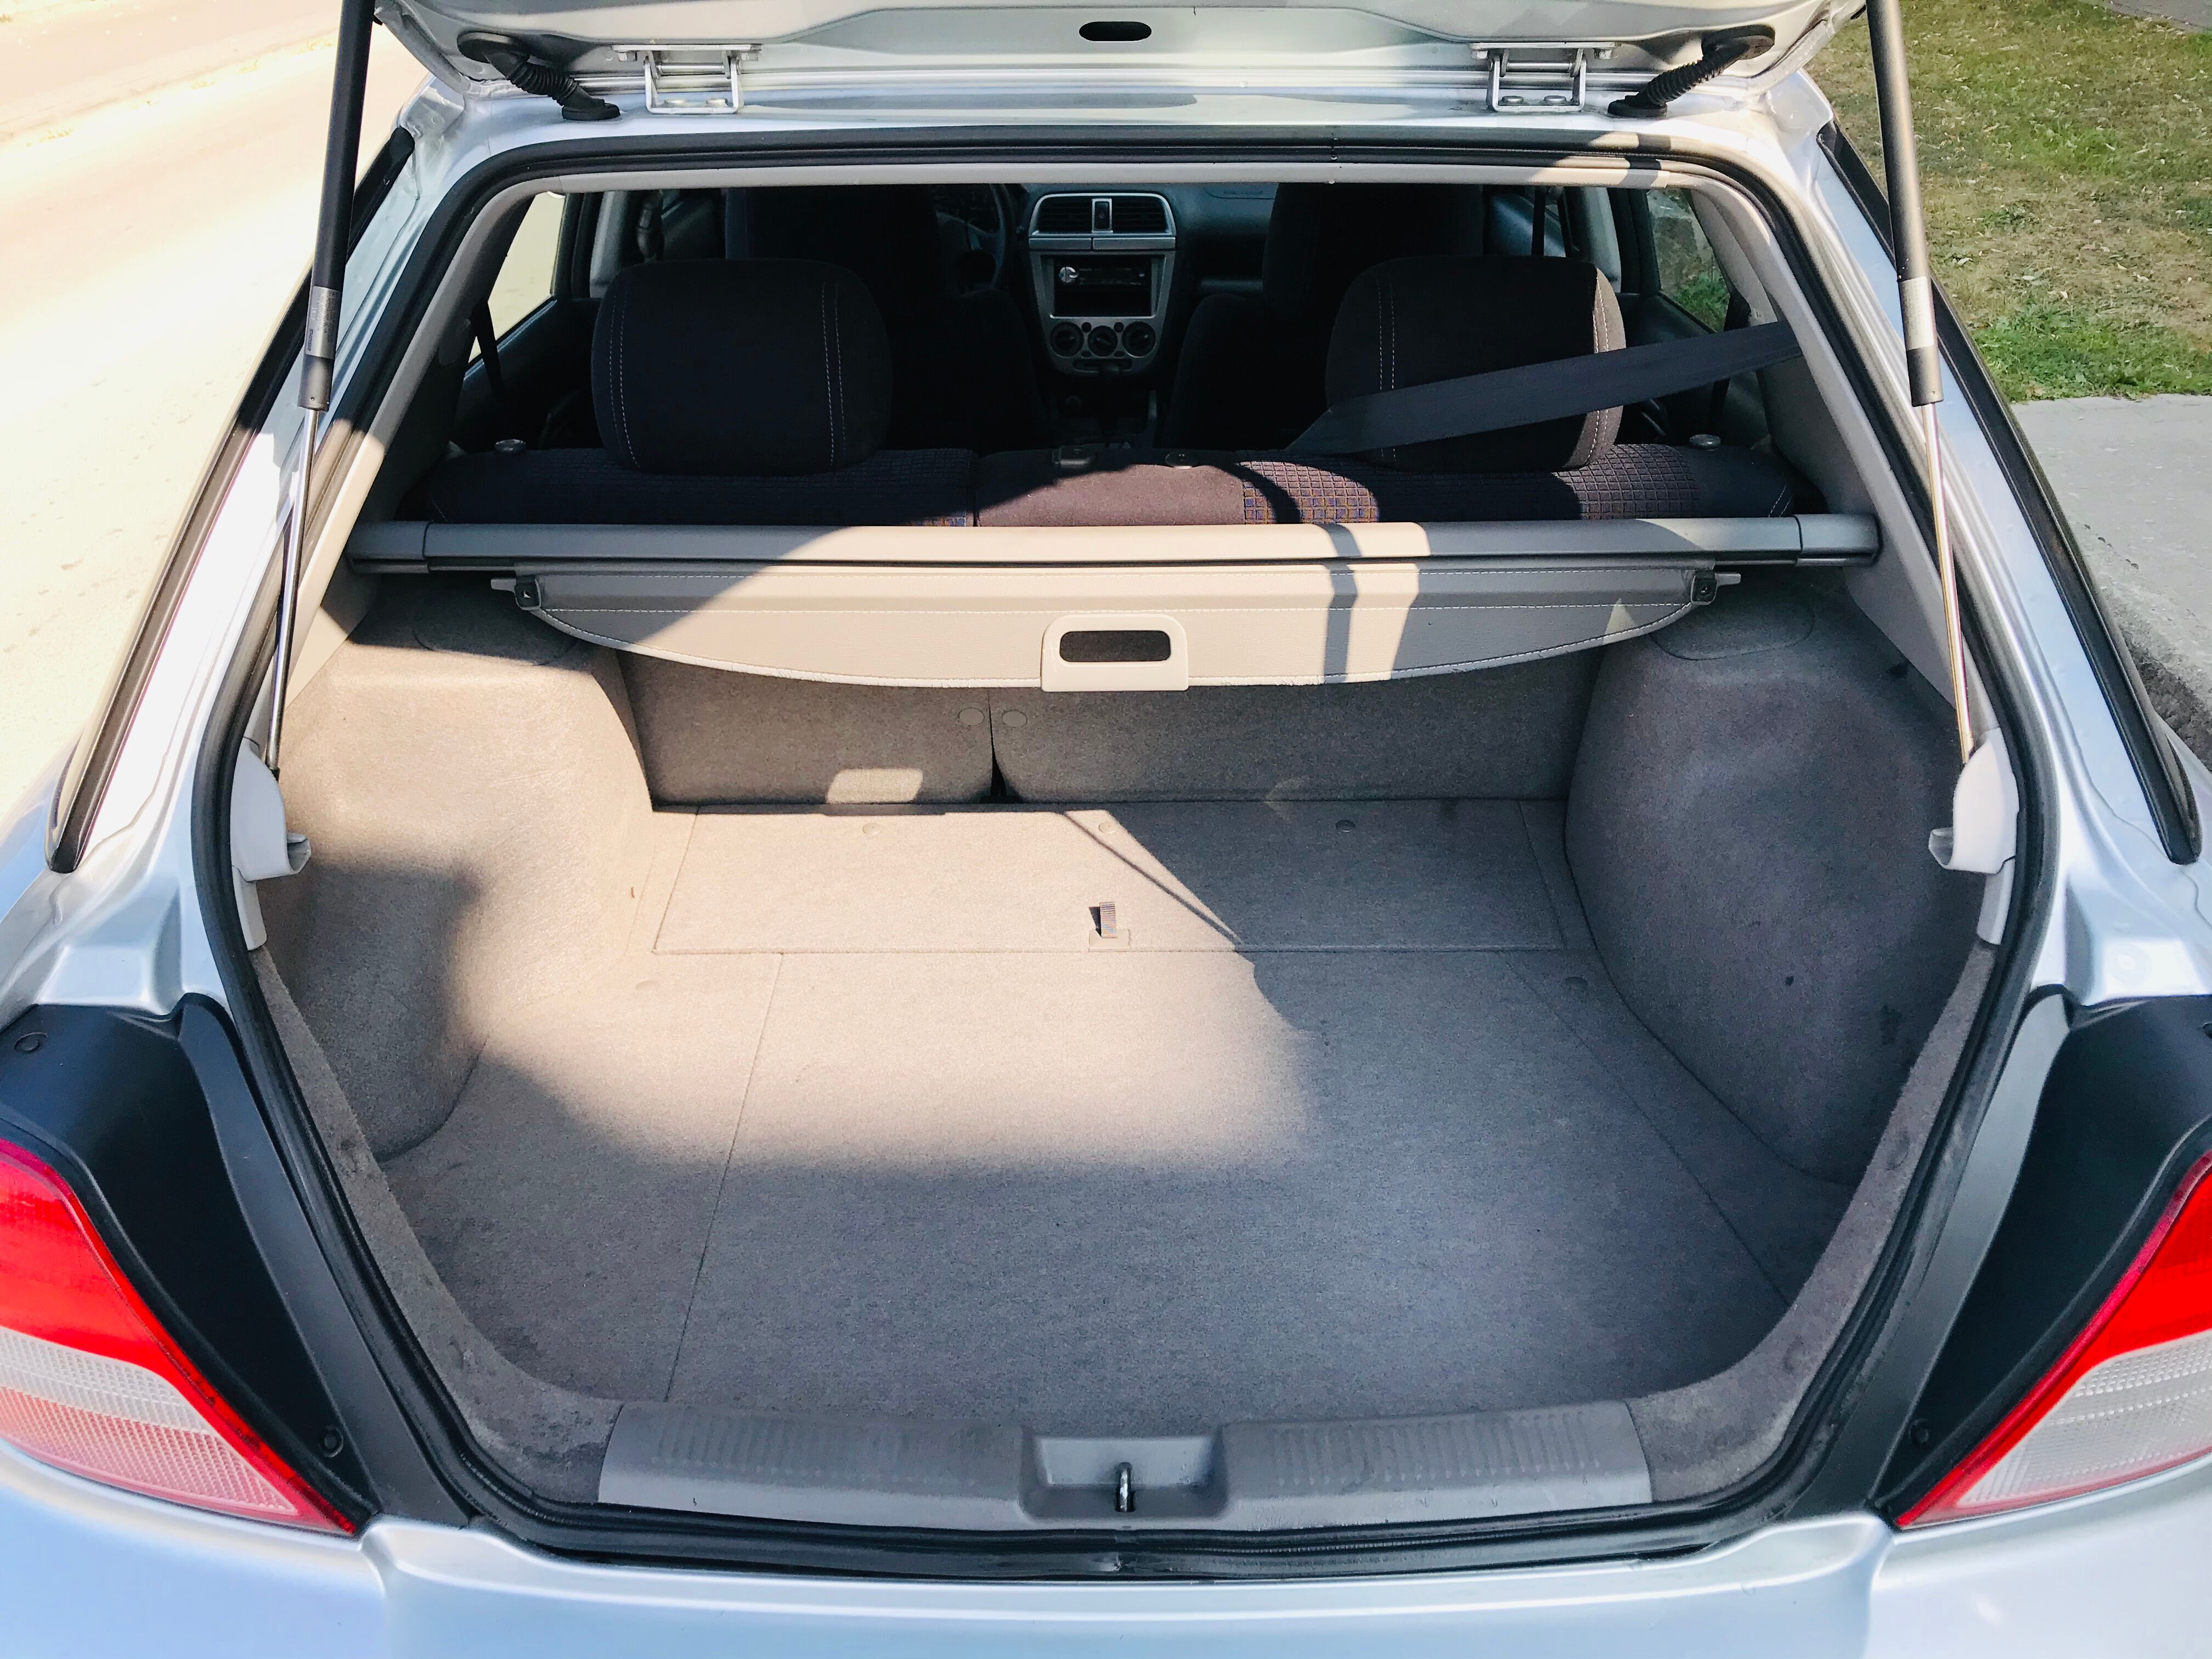 Subaru Impreza Subaru Impreza 4x4 4WD 56000KM boite auto 1,6essence